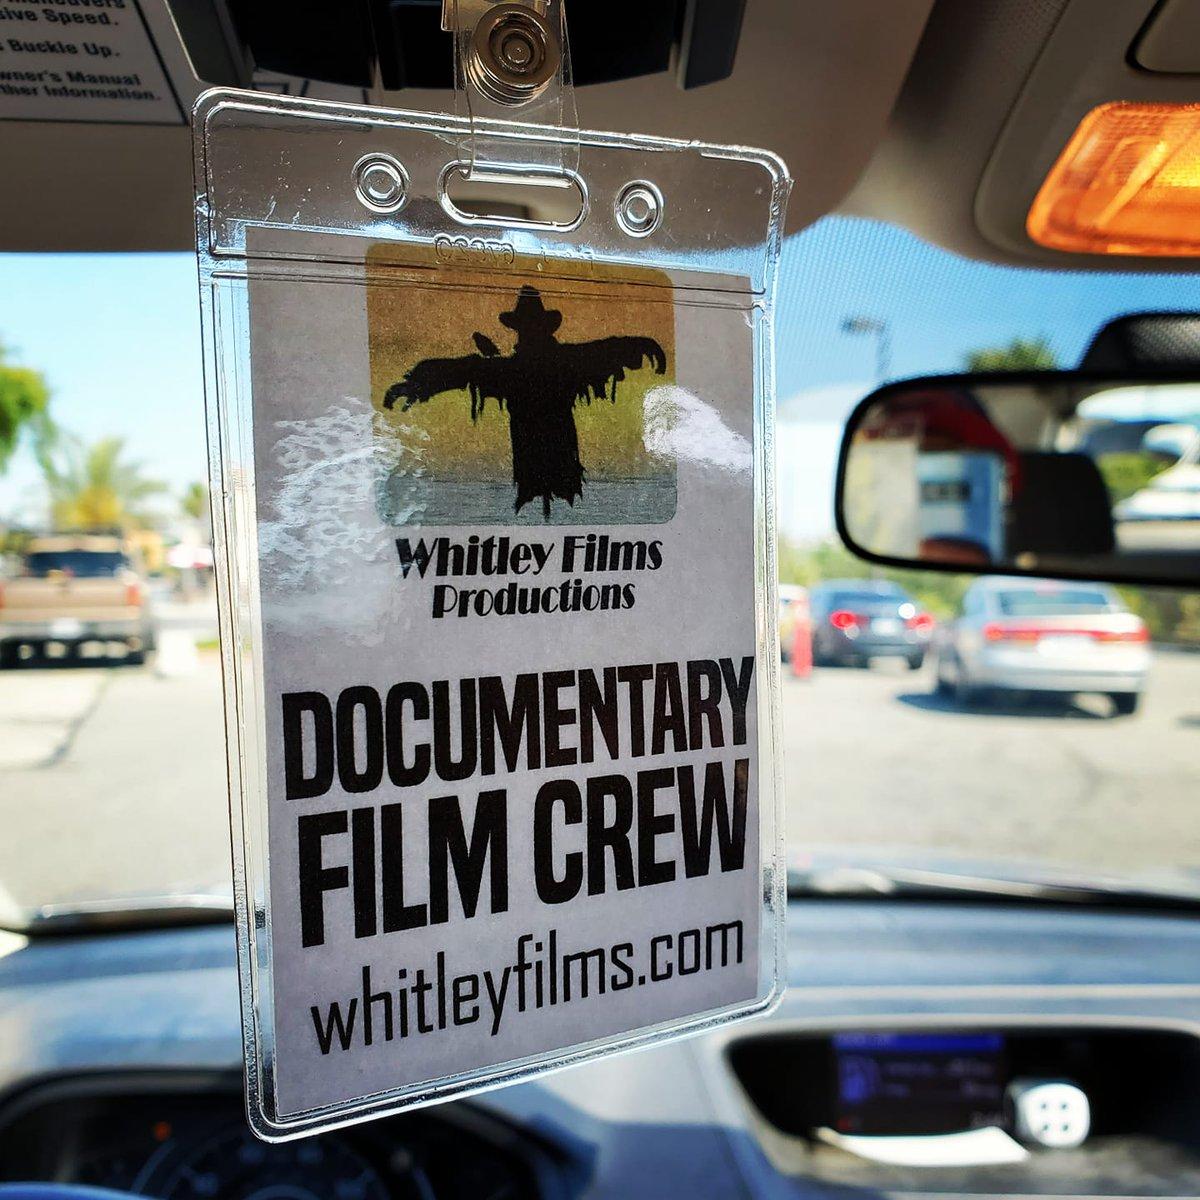 Got my #CoronaVirus press badge! #covid #covi̇d19 #documentary https://t.co/Pf6fvLPFS3